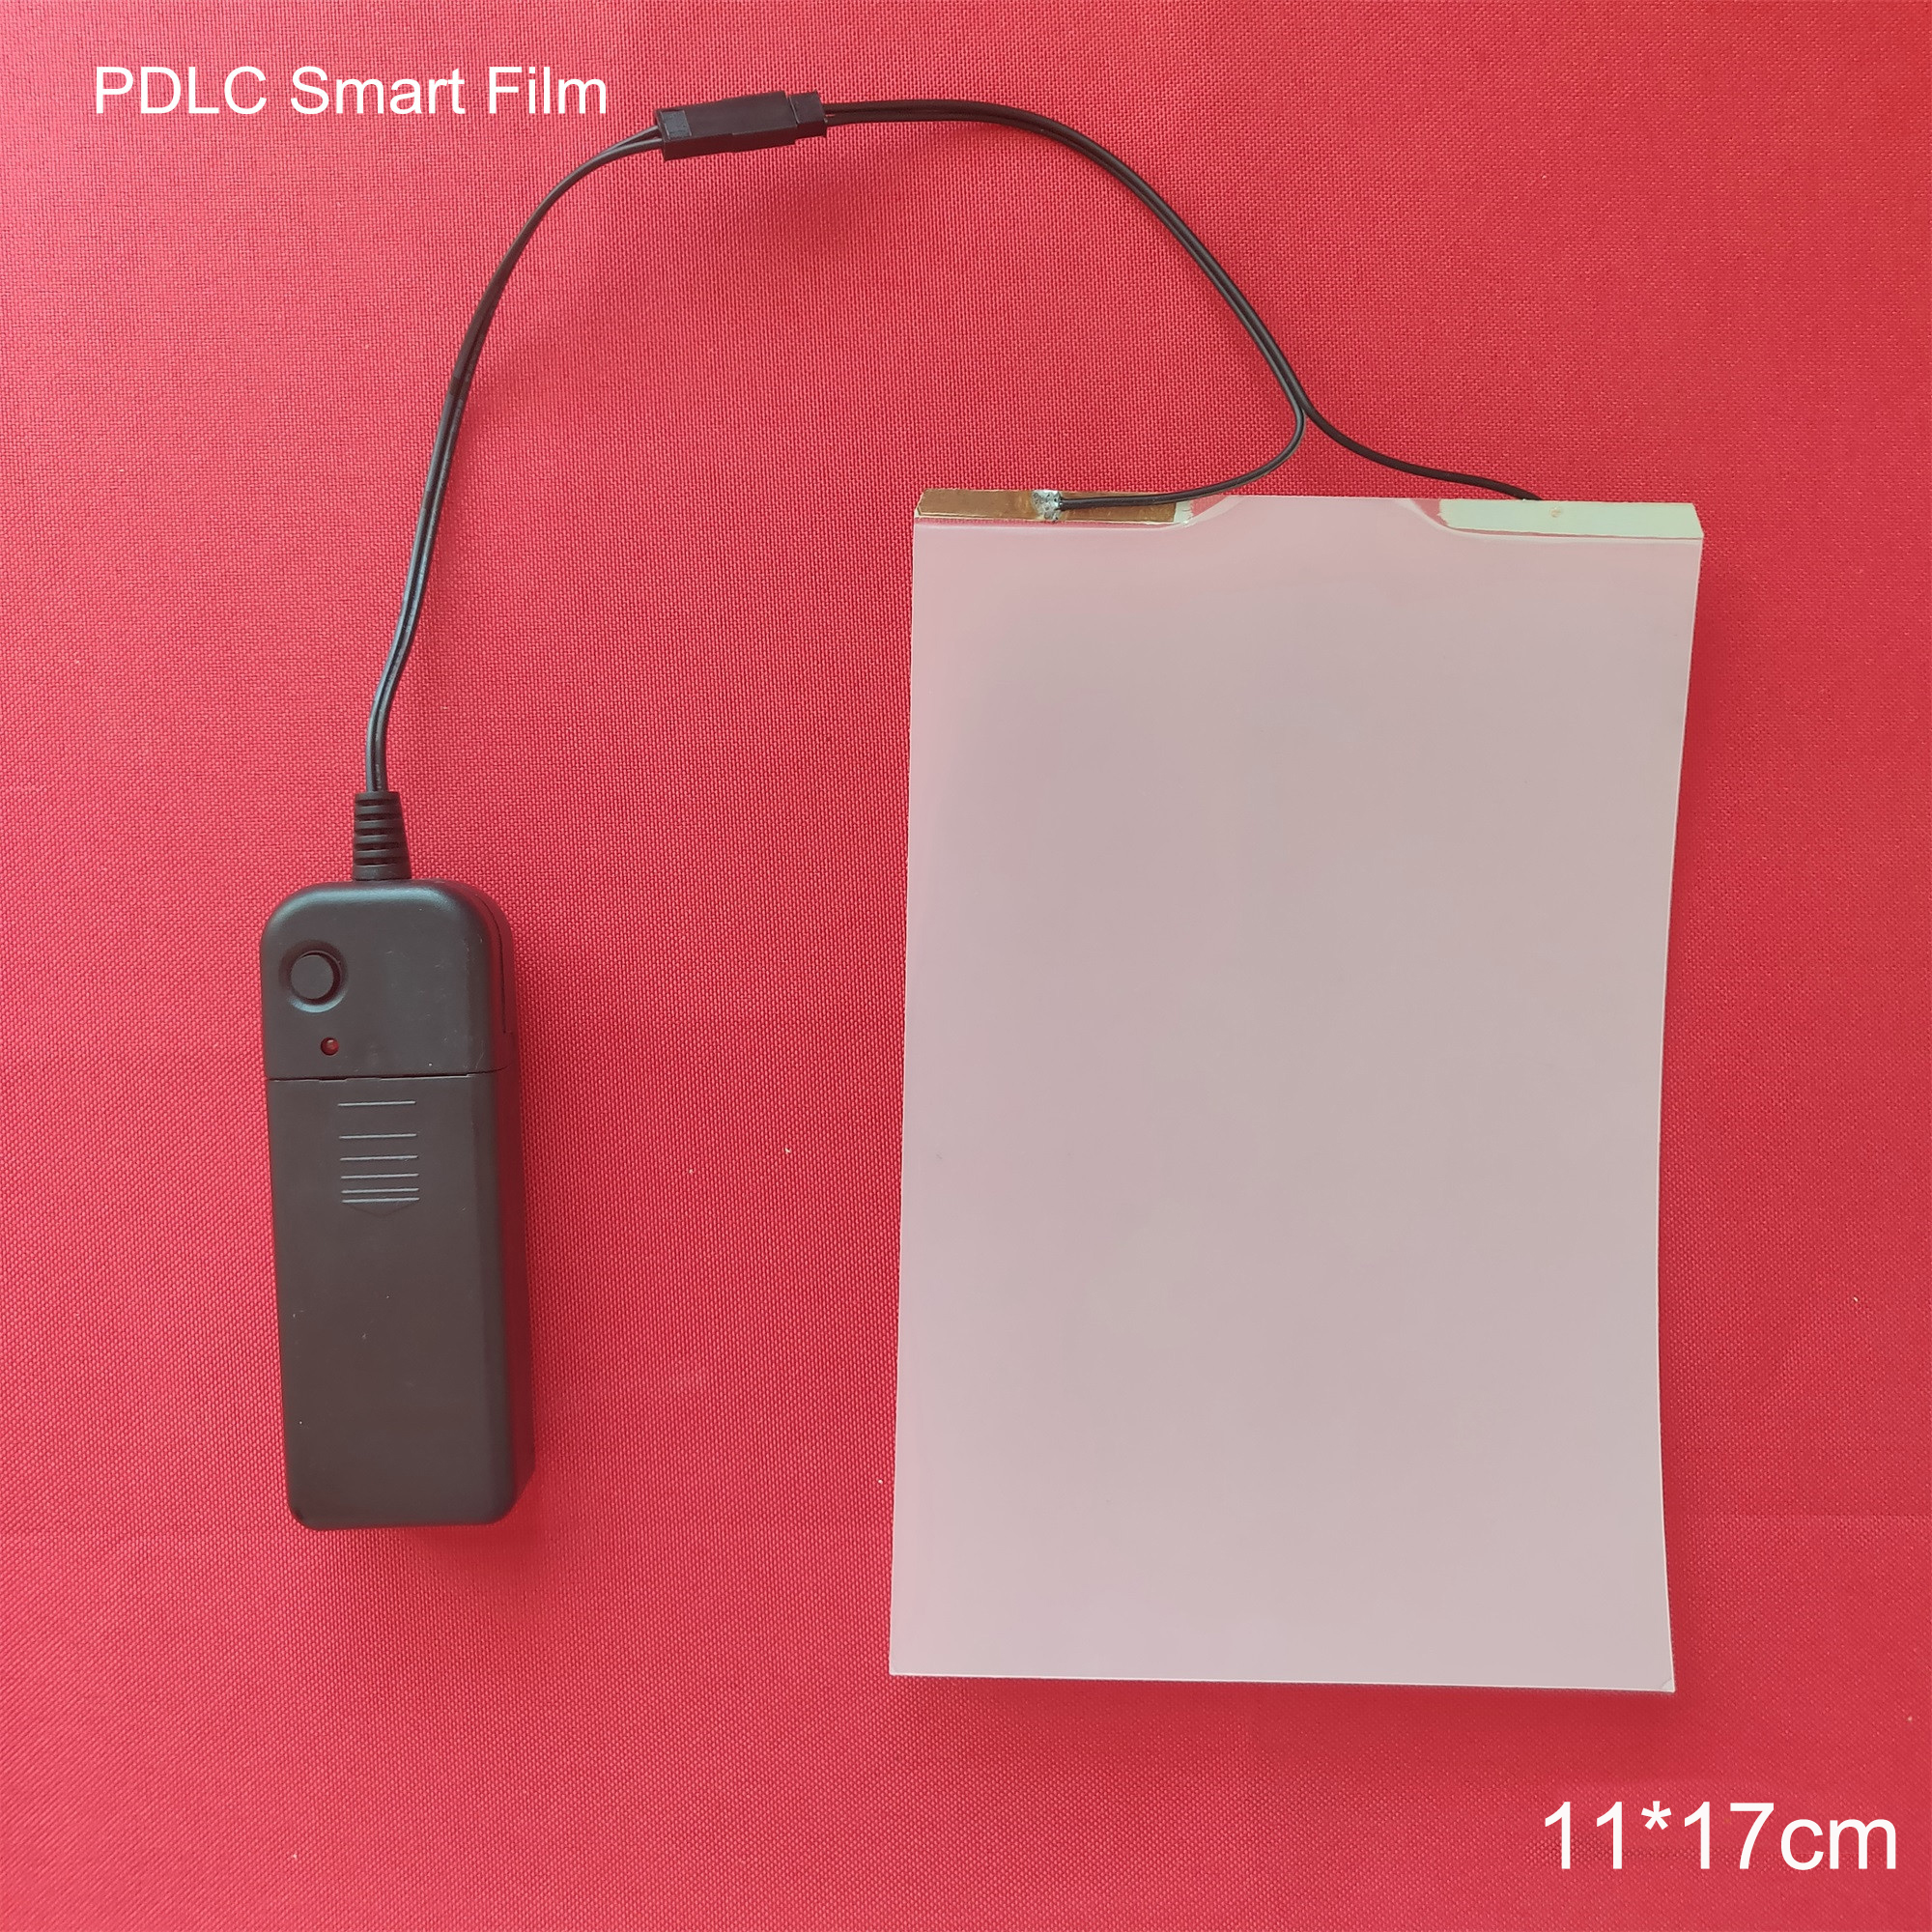 115*175mm Sample Electric Self-adhesive PDLC Film Smart Dimming Film Glass Window Door Tint Home Cinema Meeting Room